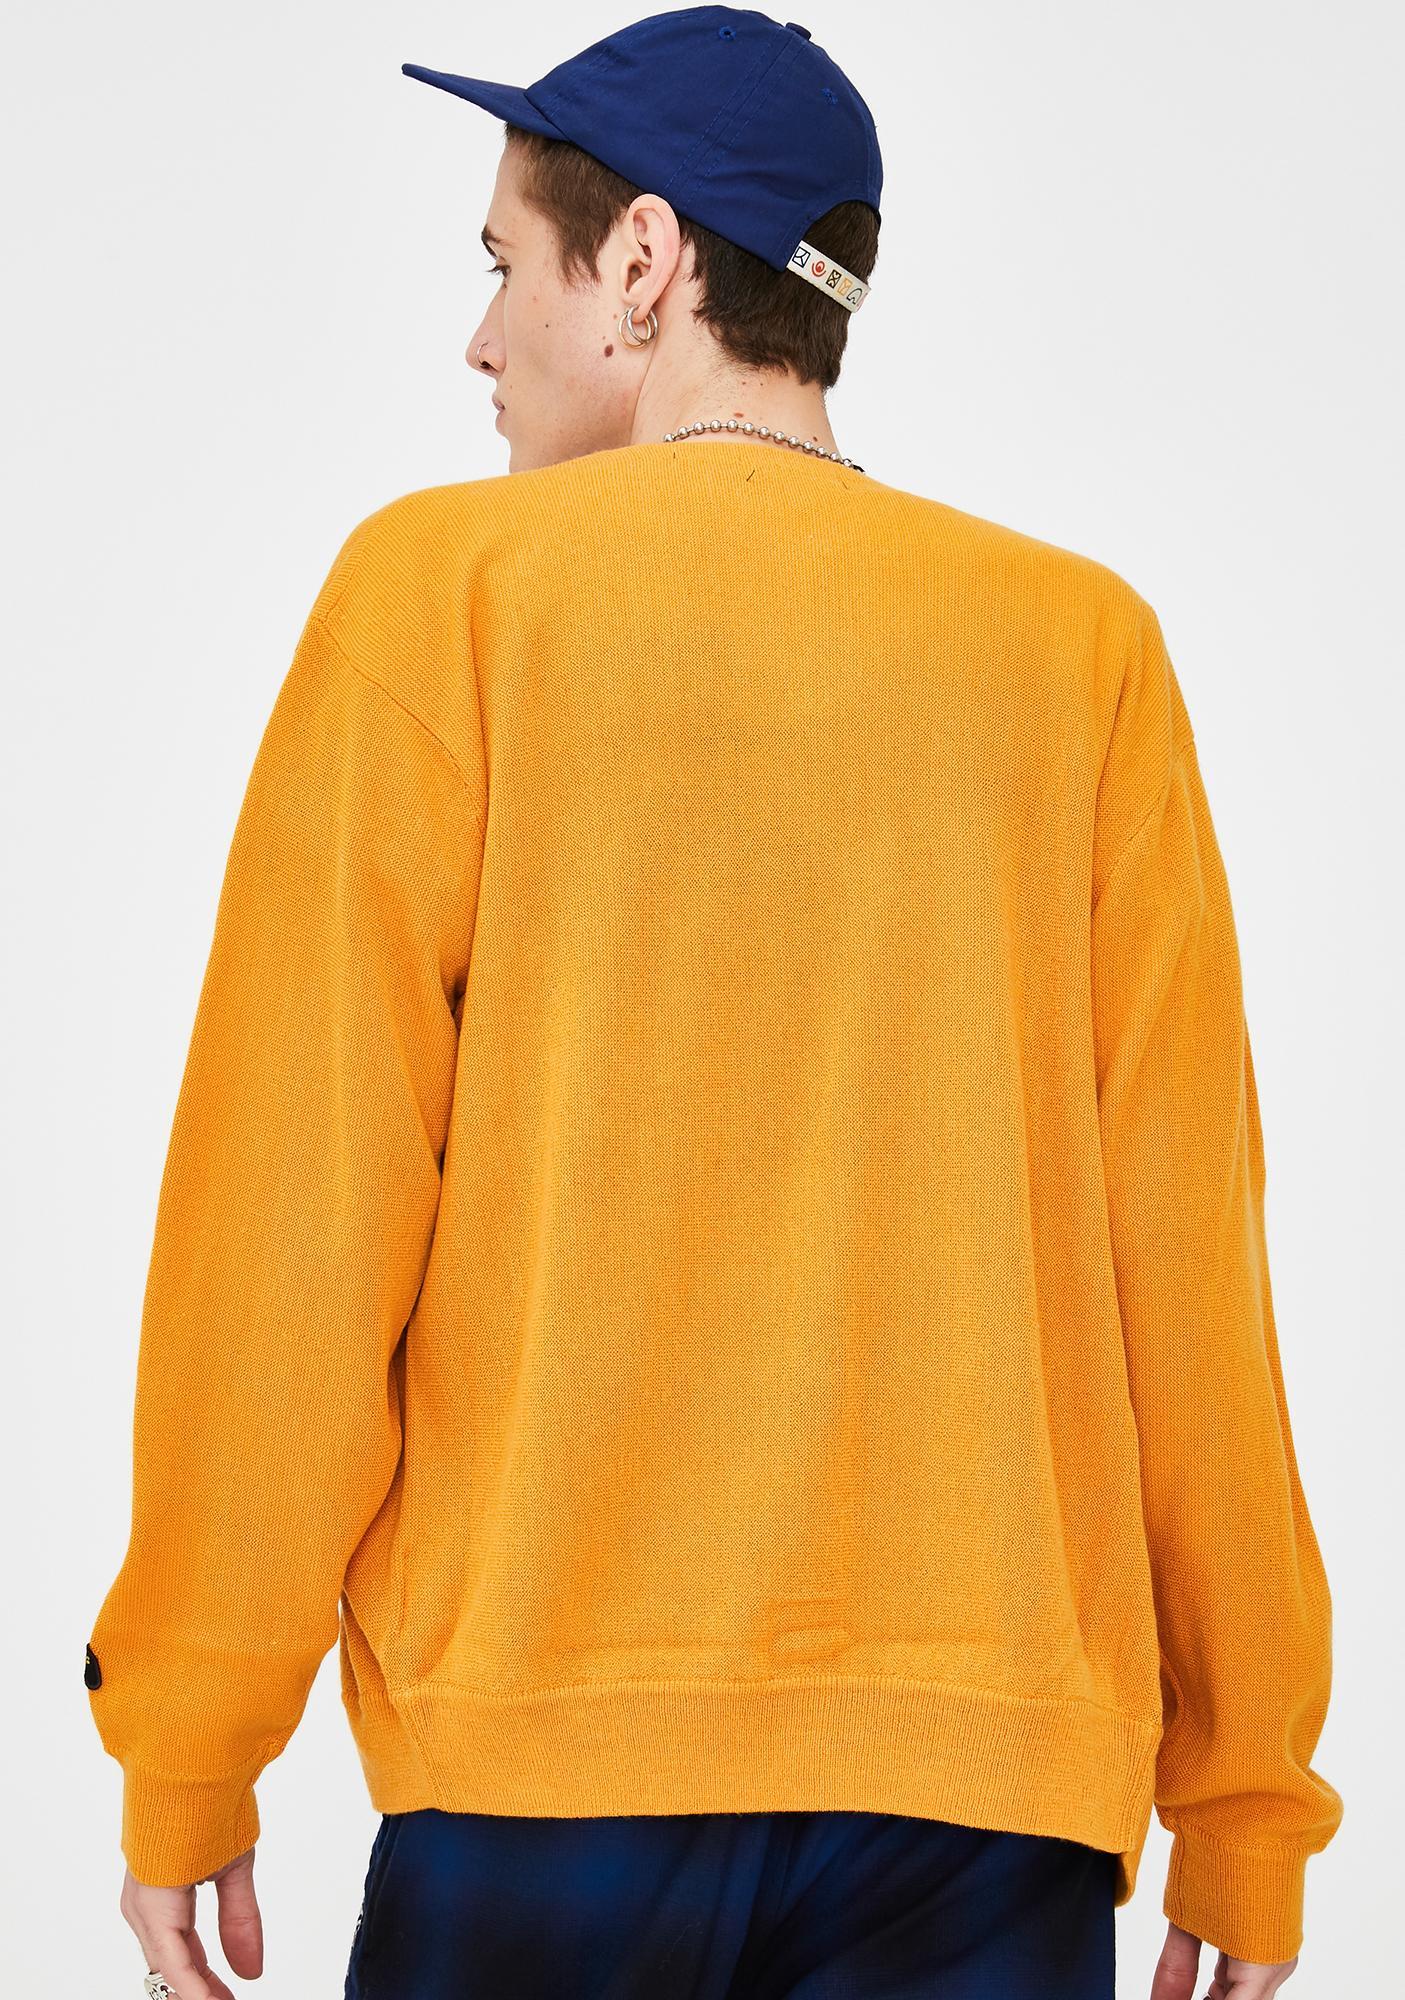 XLARGE Yellow Playful Knit Cardigan